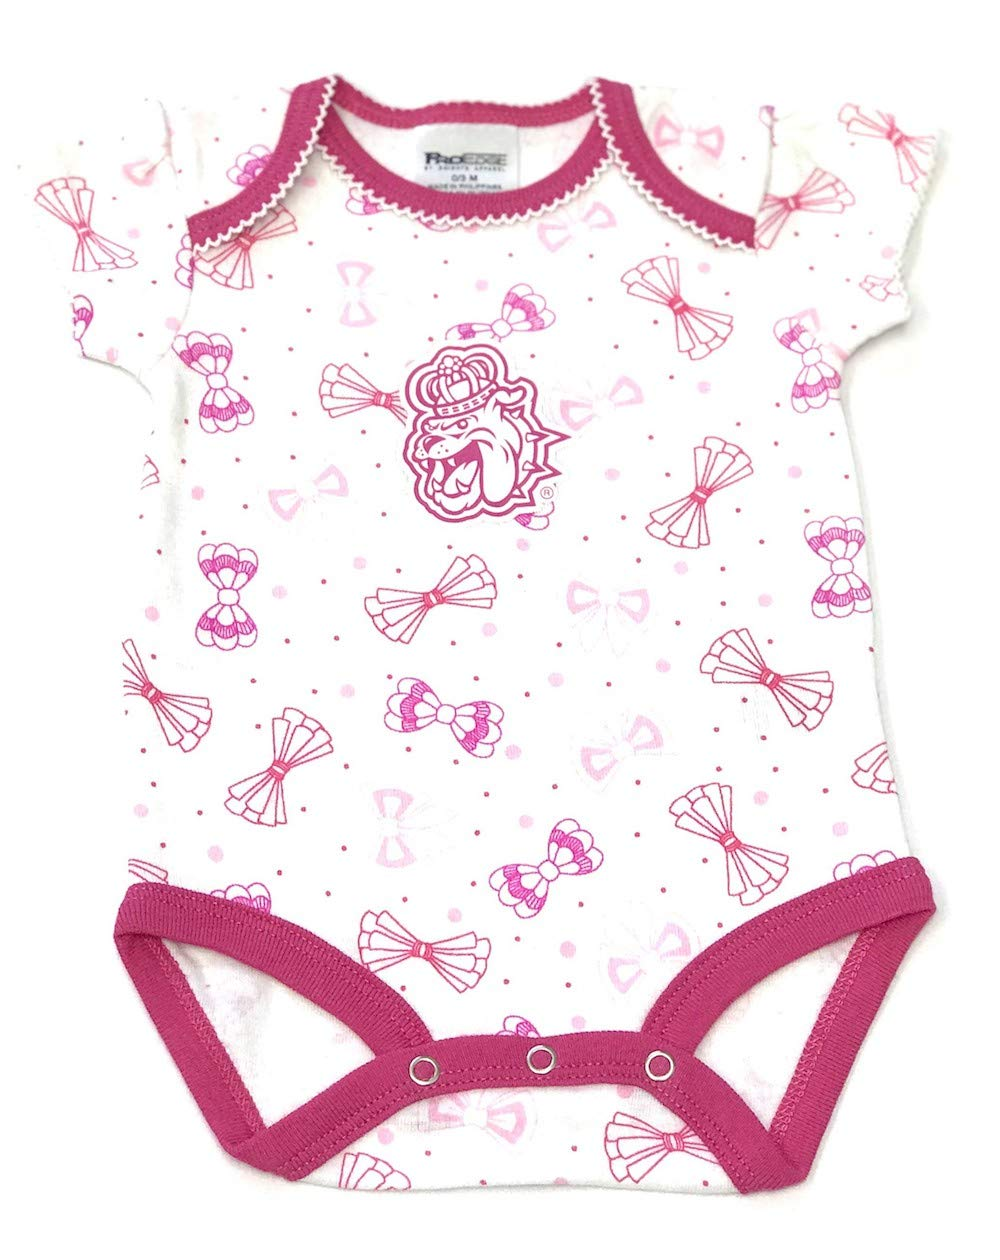 Pro Edge James Madison University Baby Fan Gear 3pc Cotton Envelope Neck Bodysuit